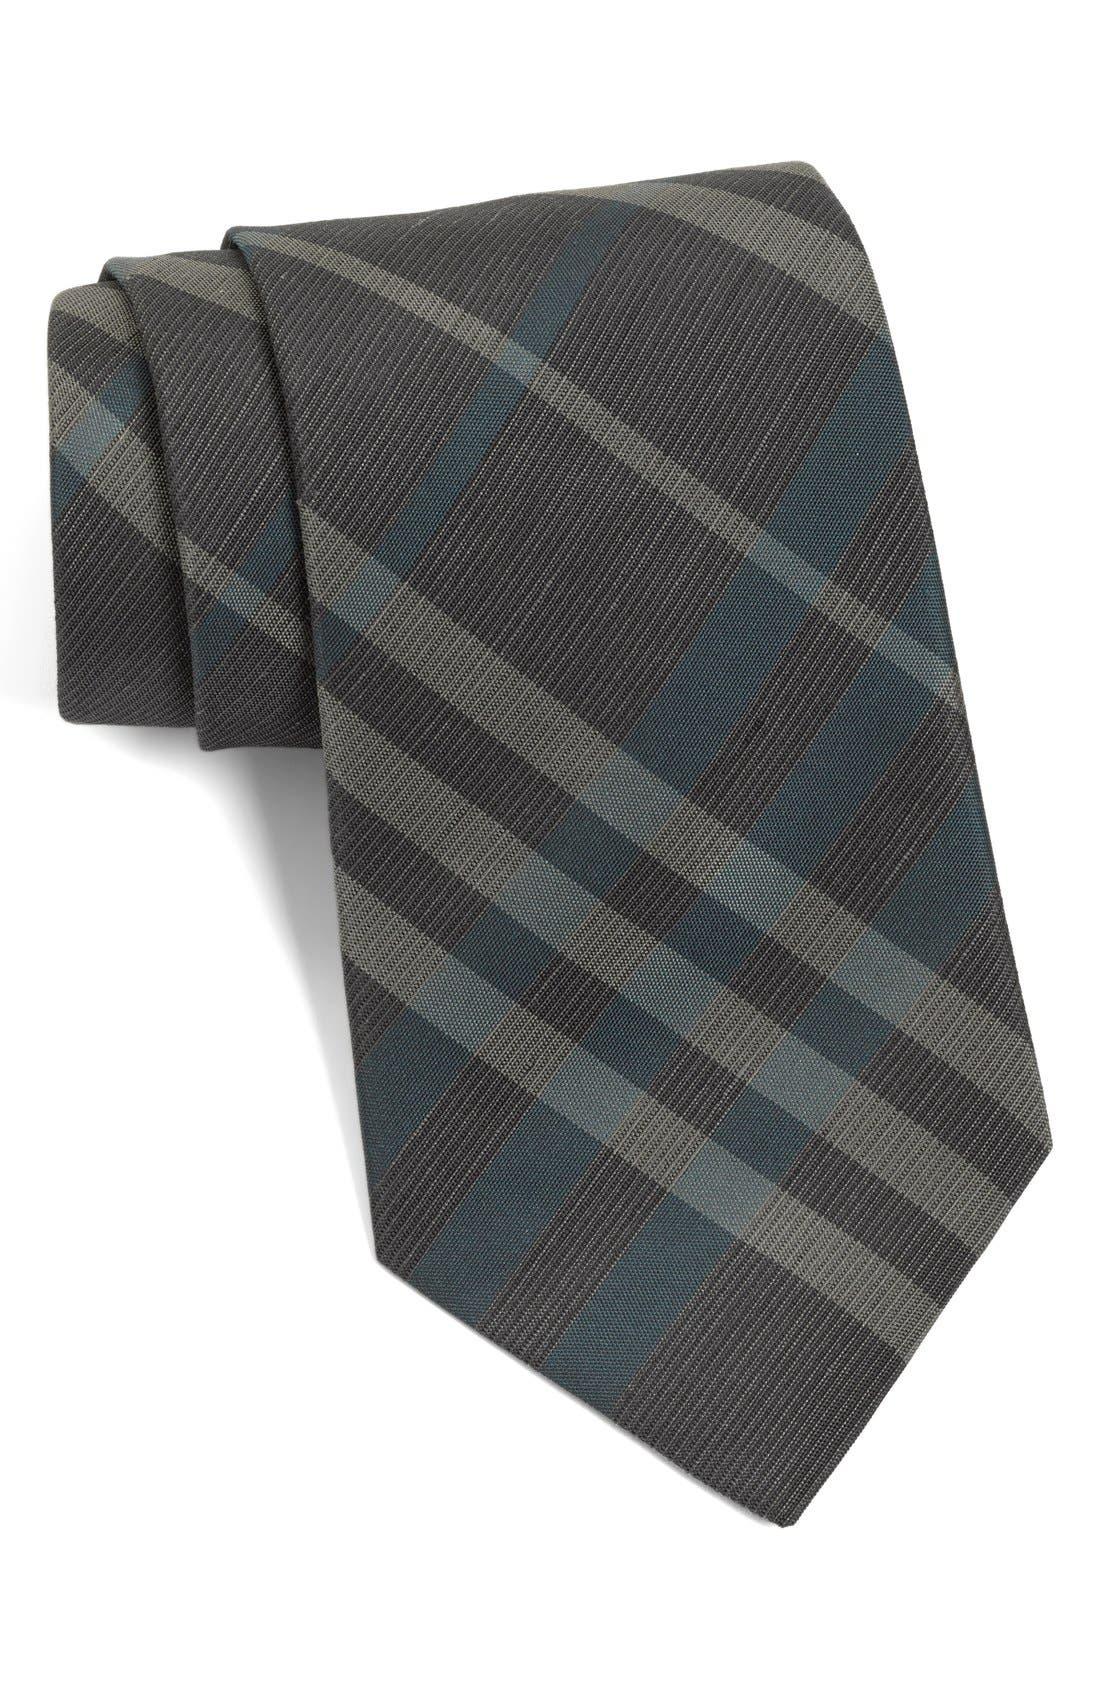 Main Image - Burberry London 'Regent' Woven Silk & Linen Tie